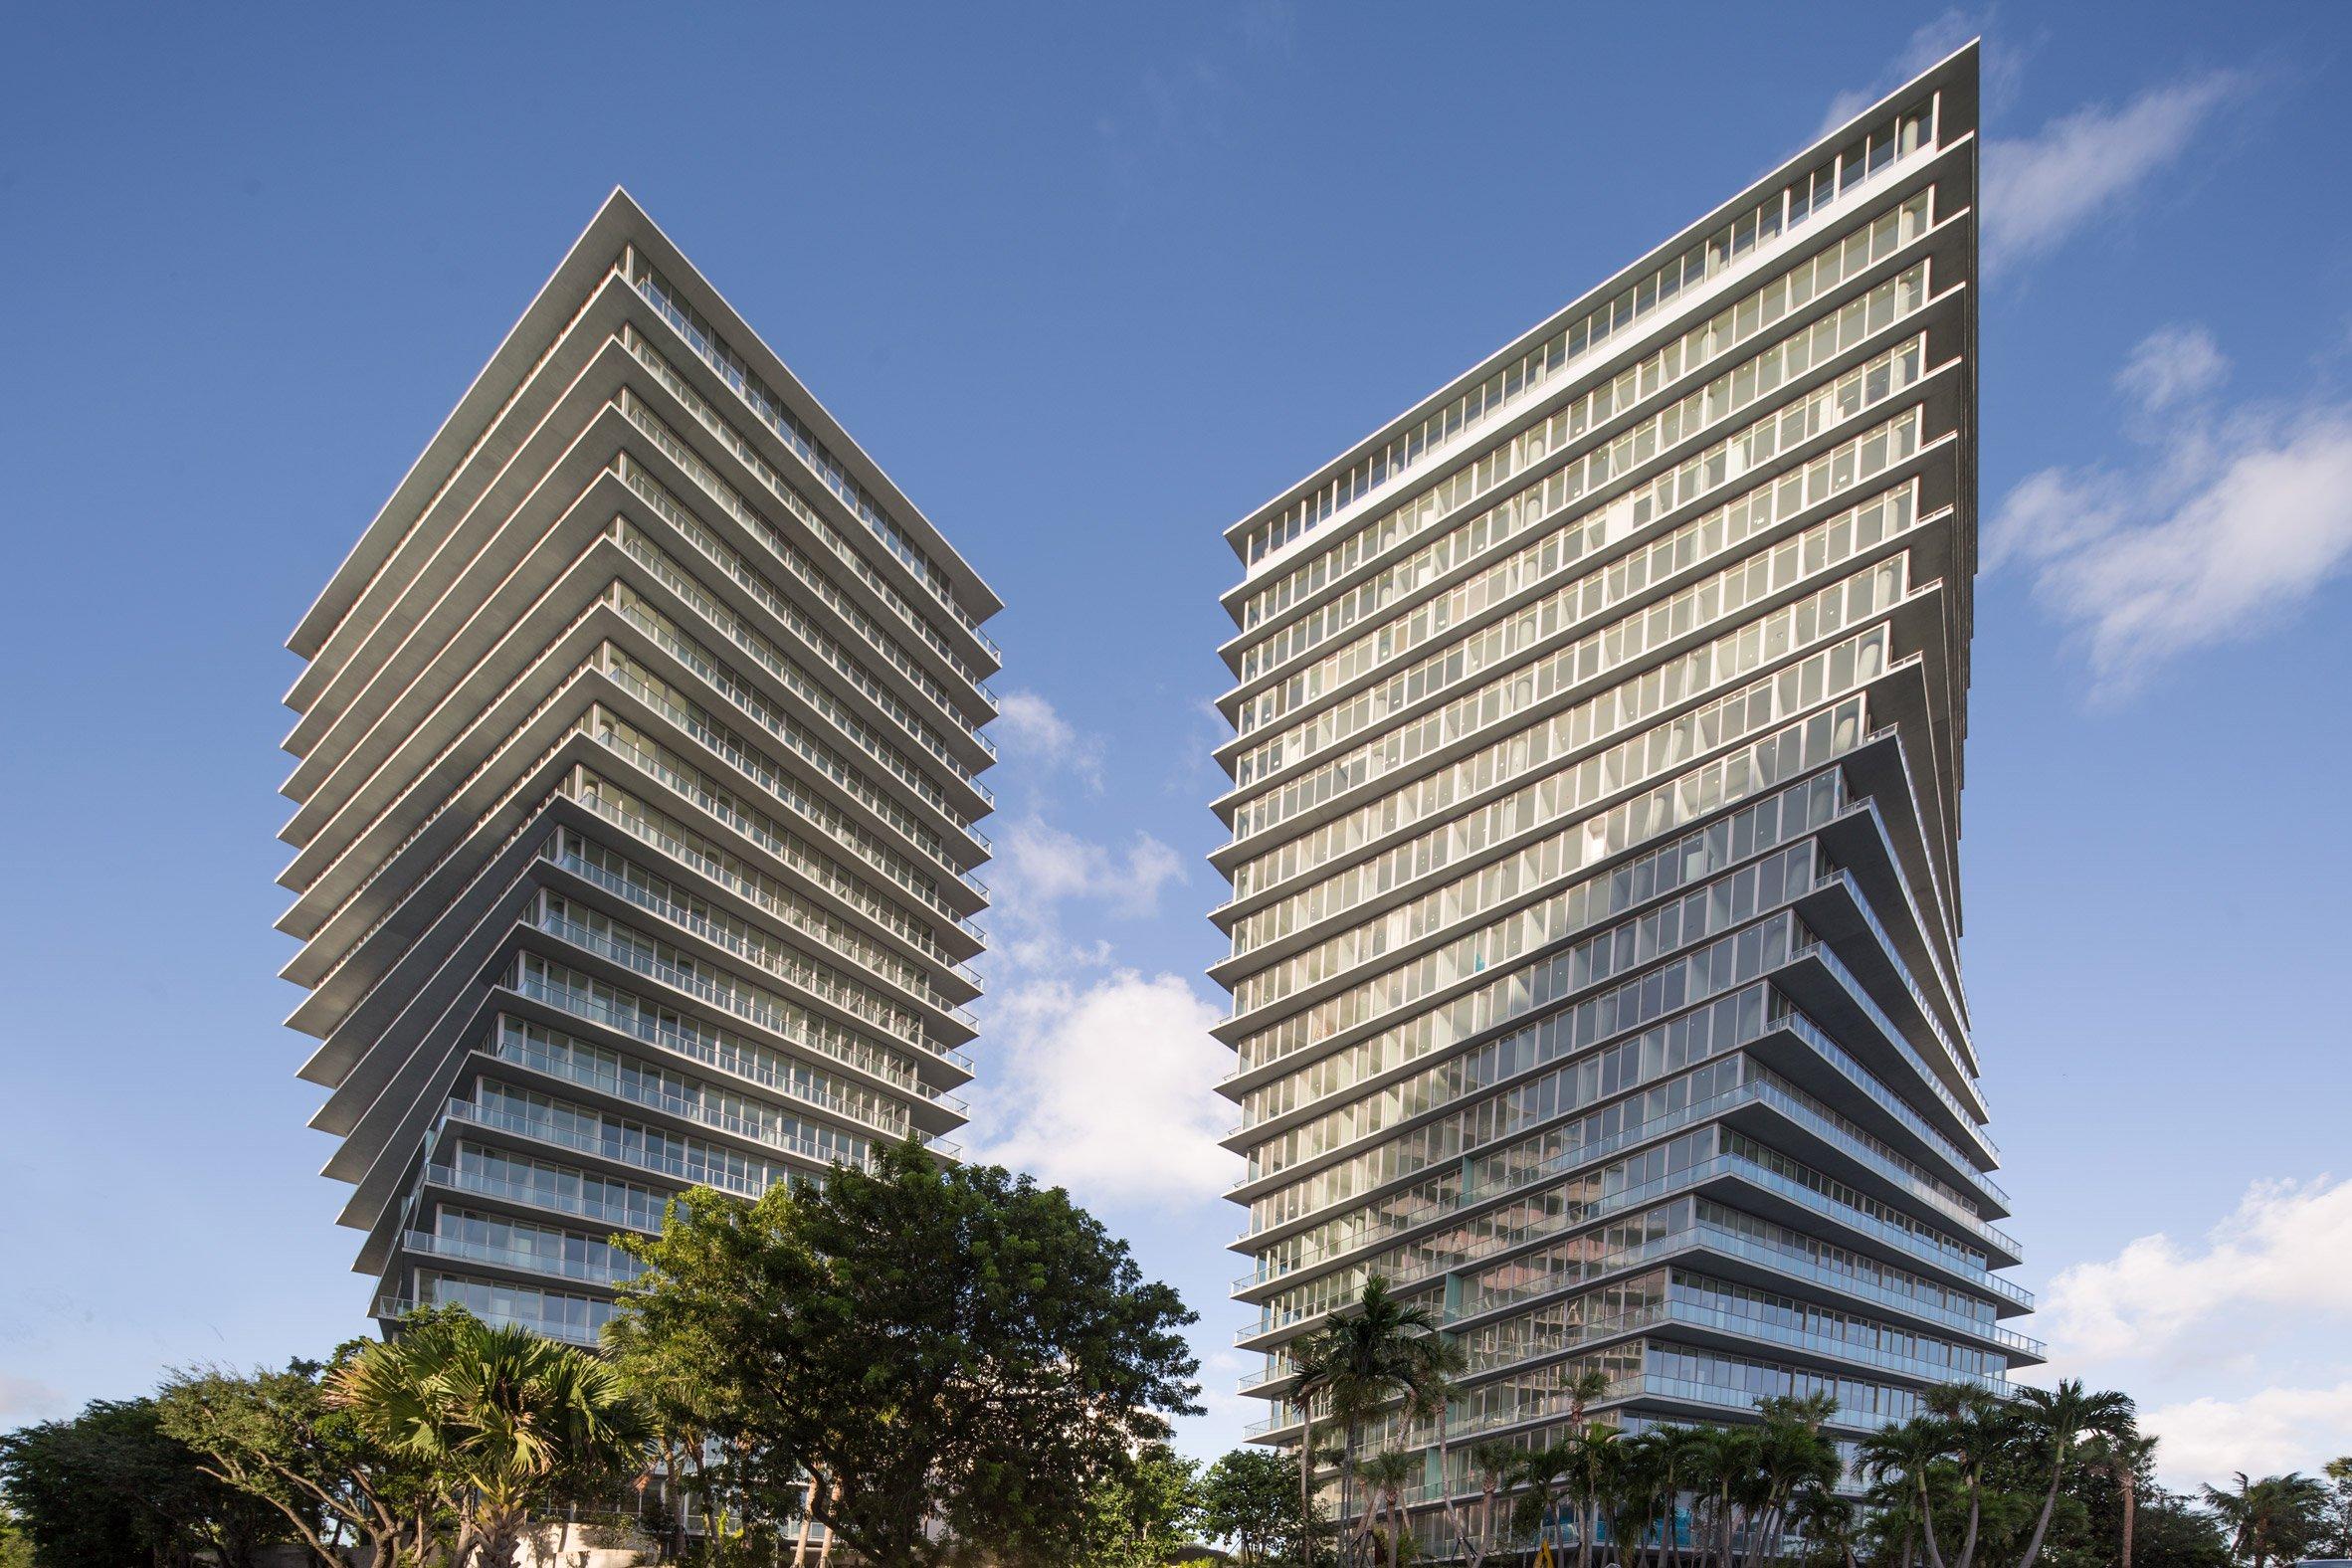 twisting-towers-by-bjarke-ingels-architecture-nyc_dezeen_2364_col_7